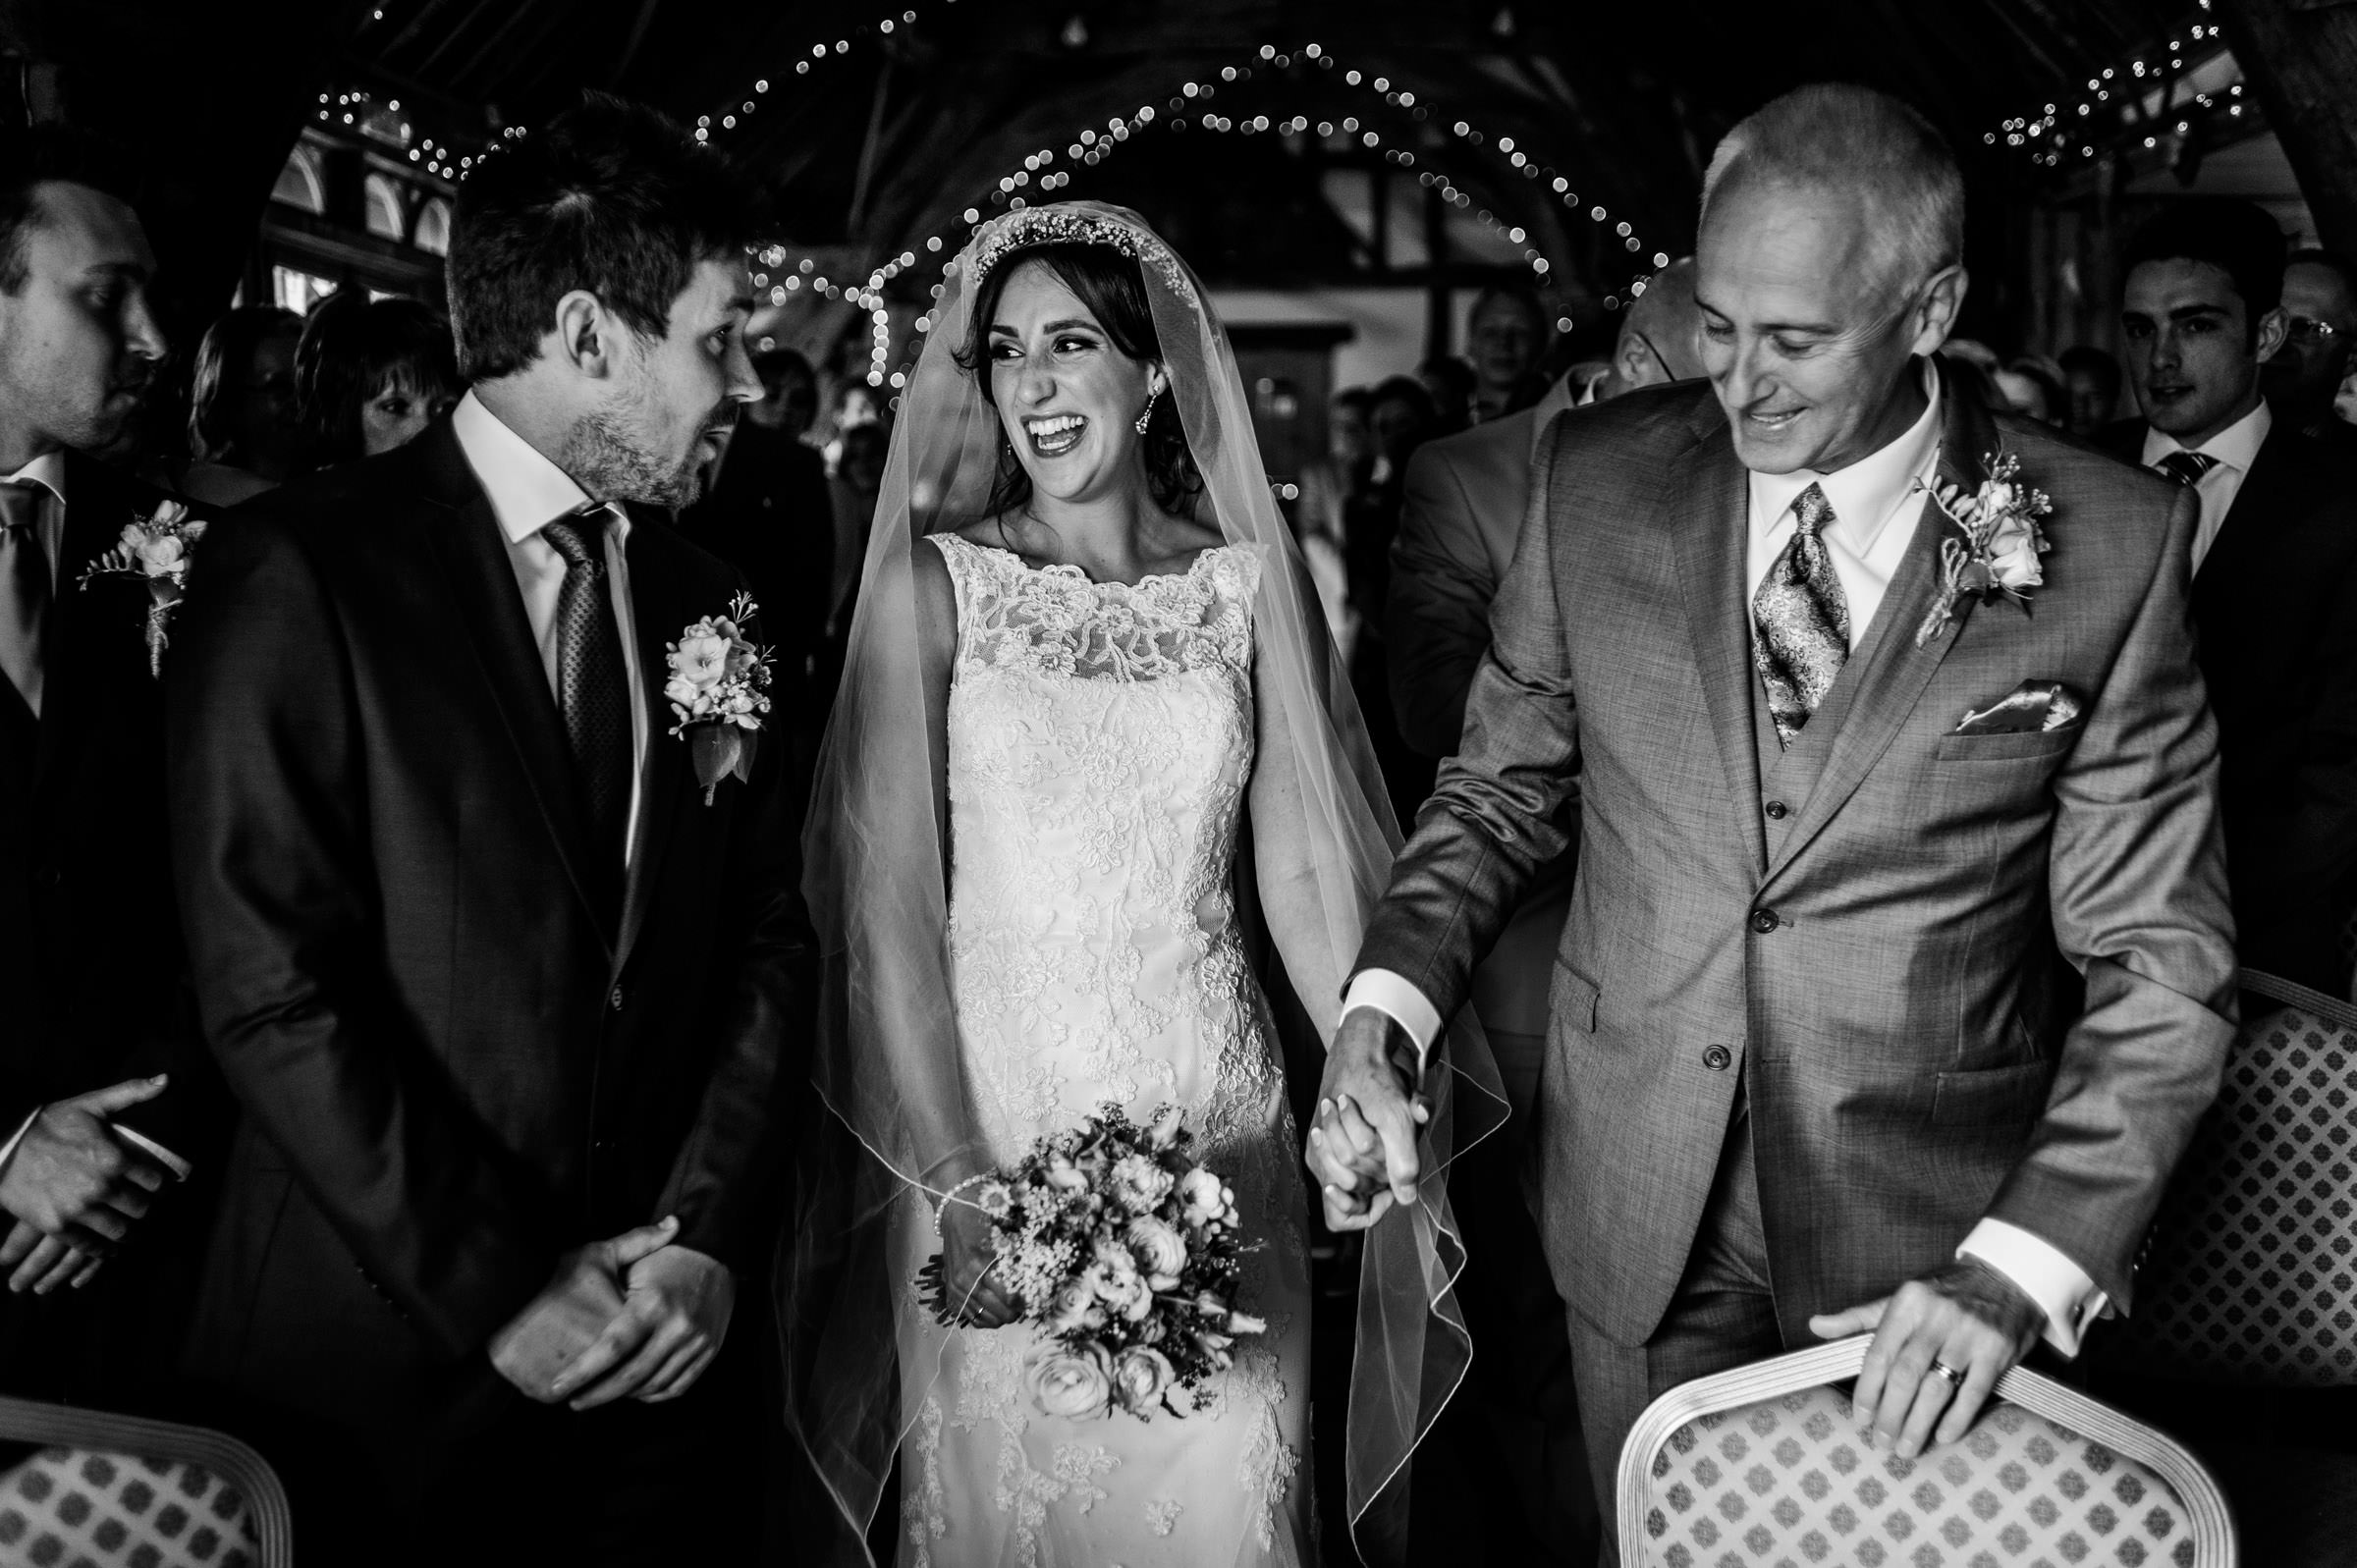 Notley Tythe Barn Reportage Wedding Photos 013.jpg